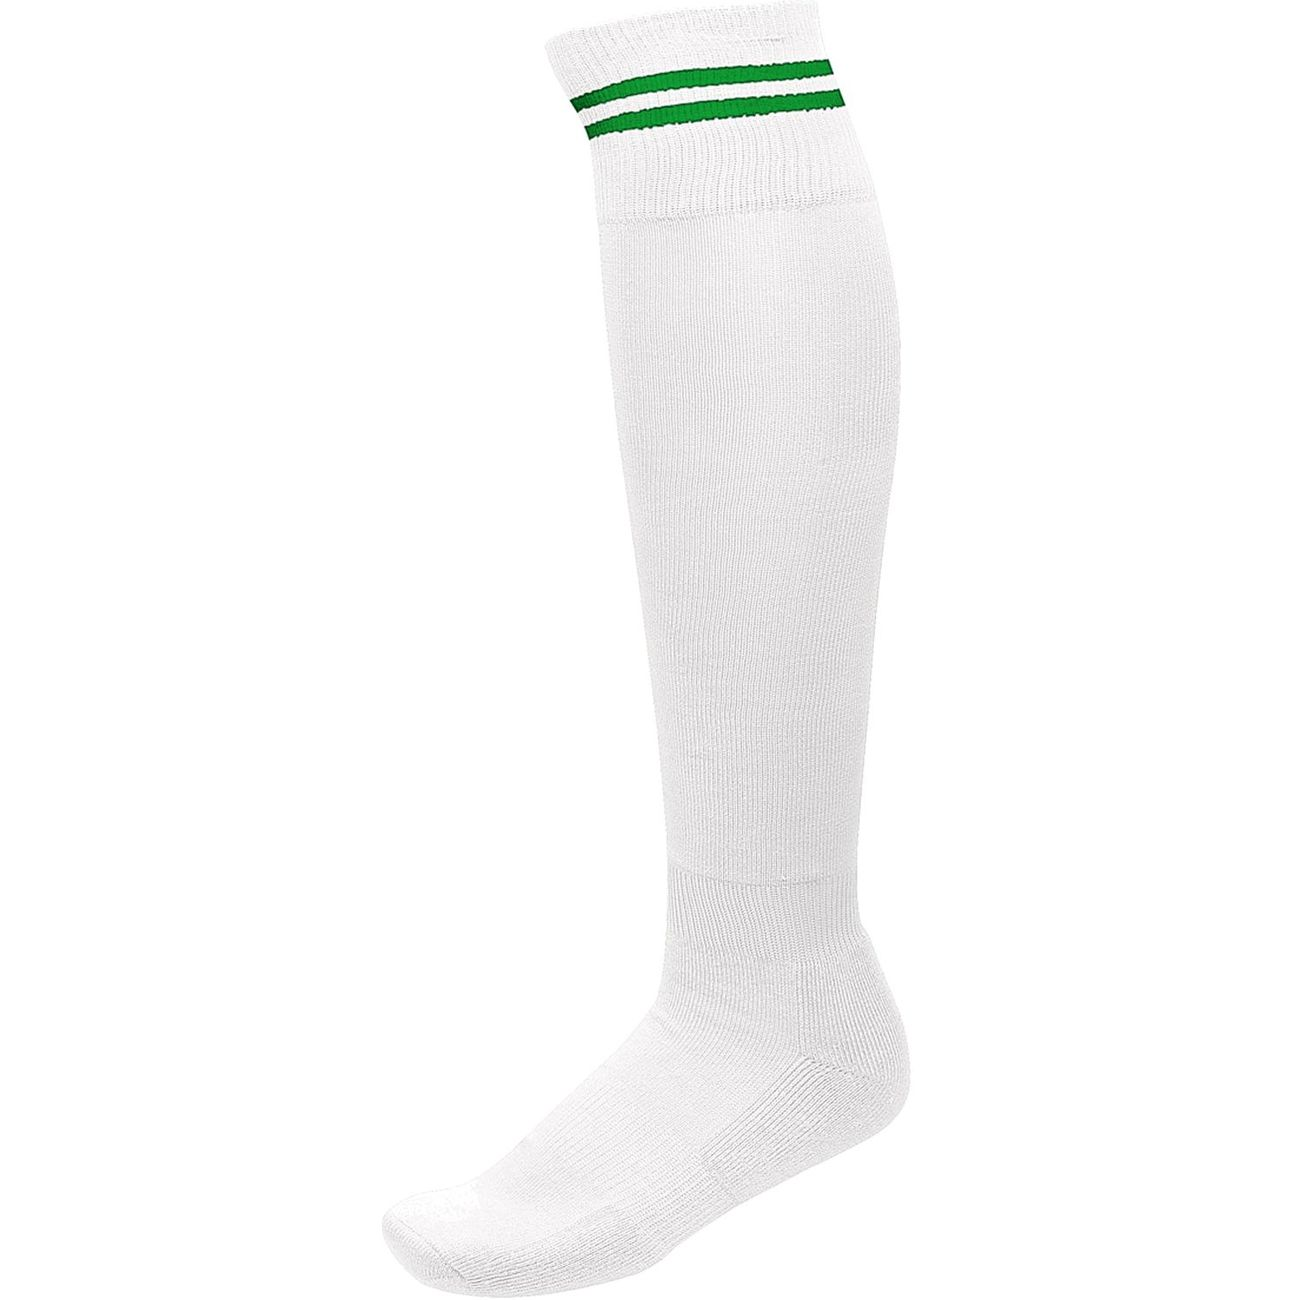 chaussettes antid/érapantes thermales /à rayures pour hommes REDTAG